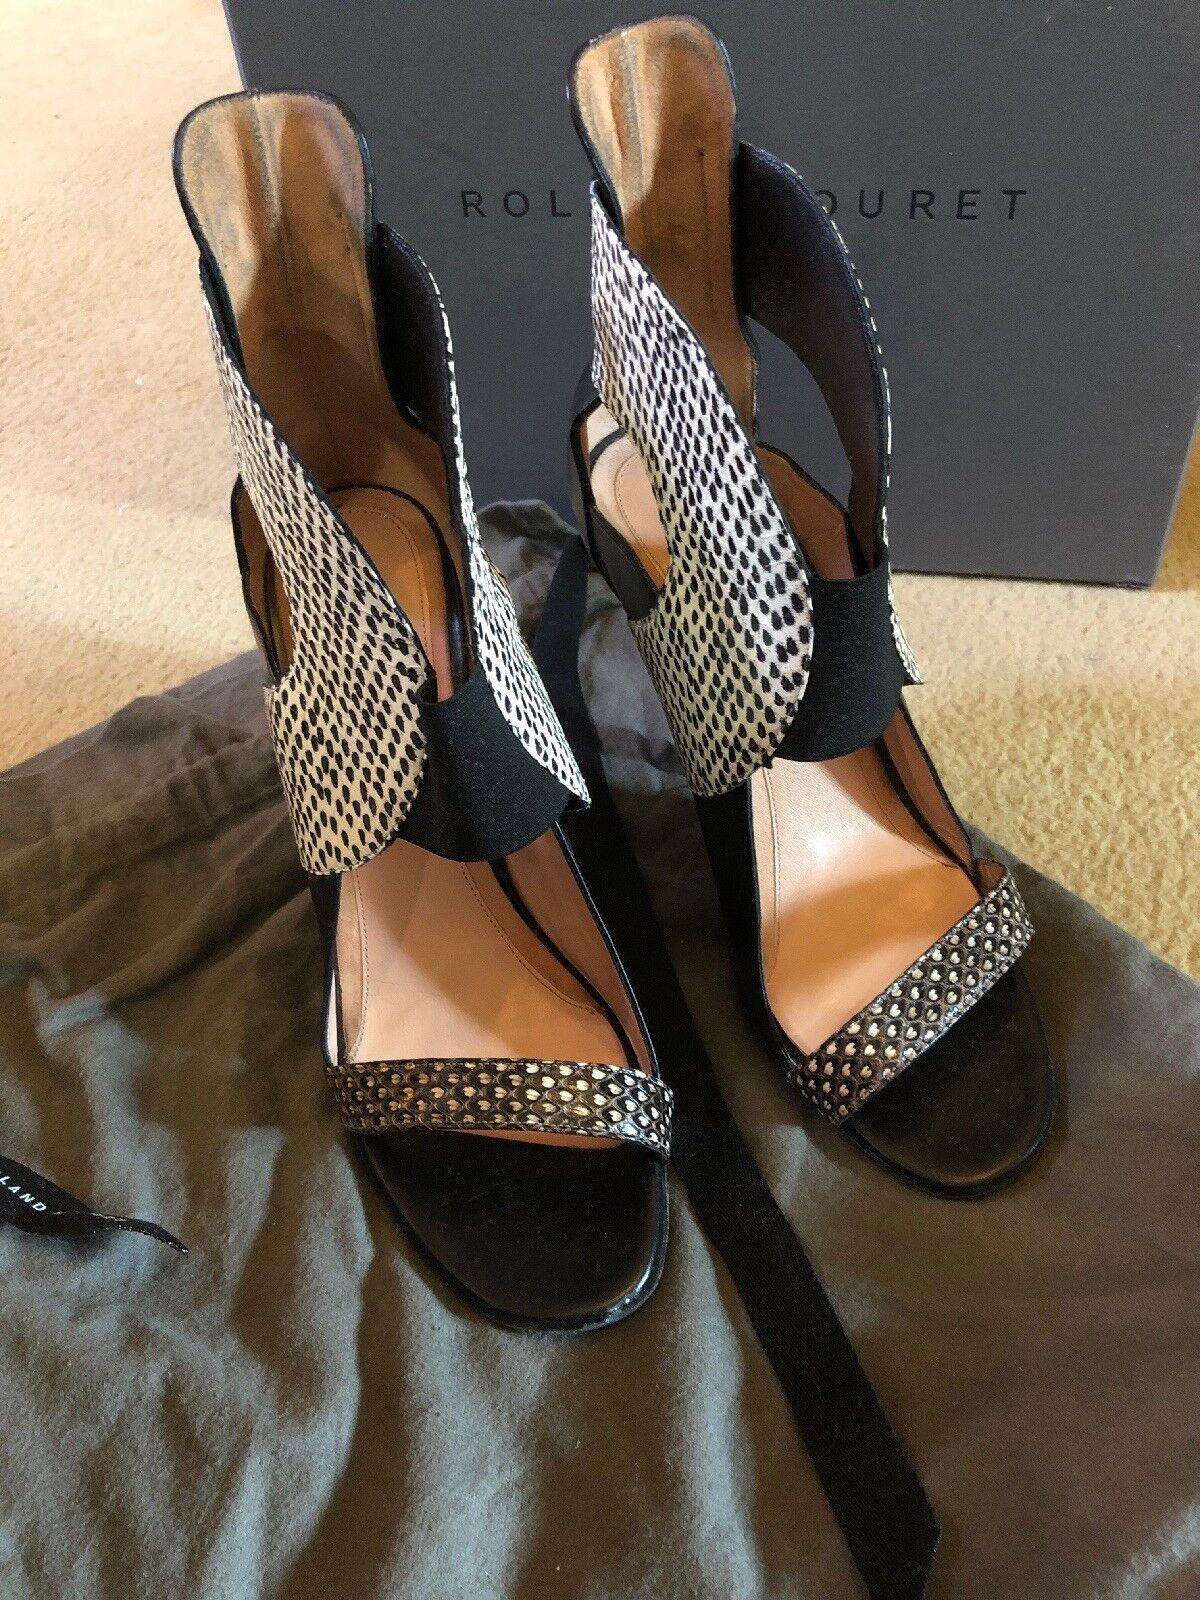 ROLAND MOURET Snake Fancy Schuhes Stiefel 41 41 41 8 STUNNING 0afdd7